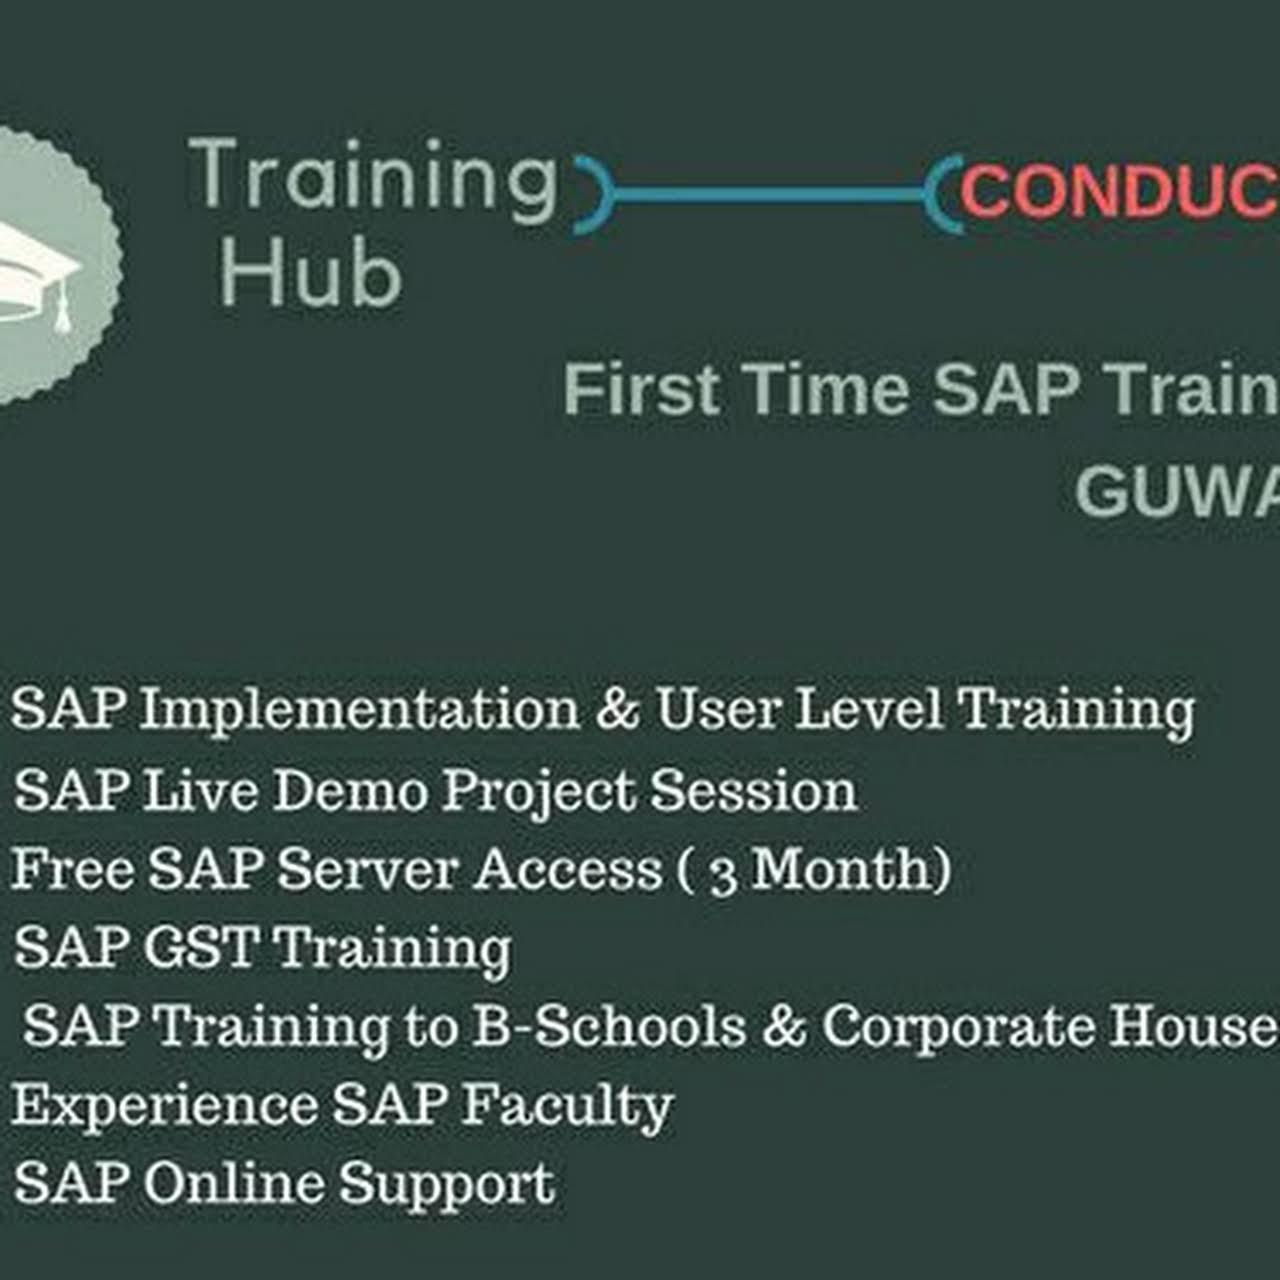 Training Hub (SAP) - First time SAP Training in Guwahati, Assam